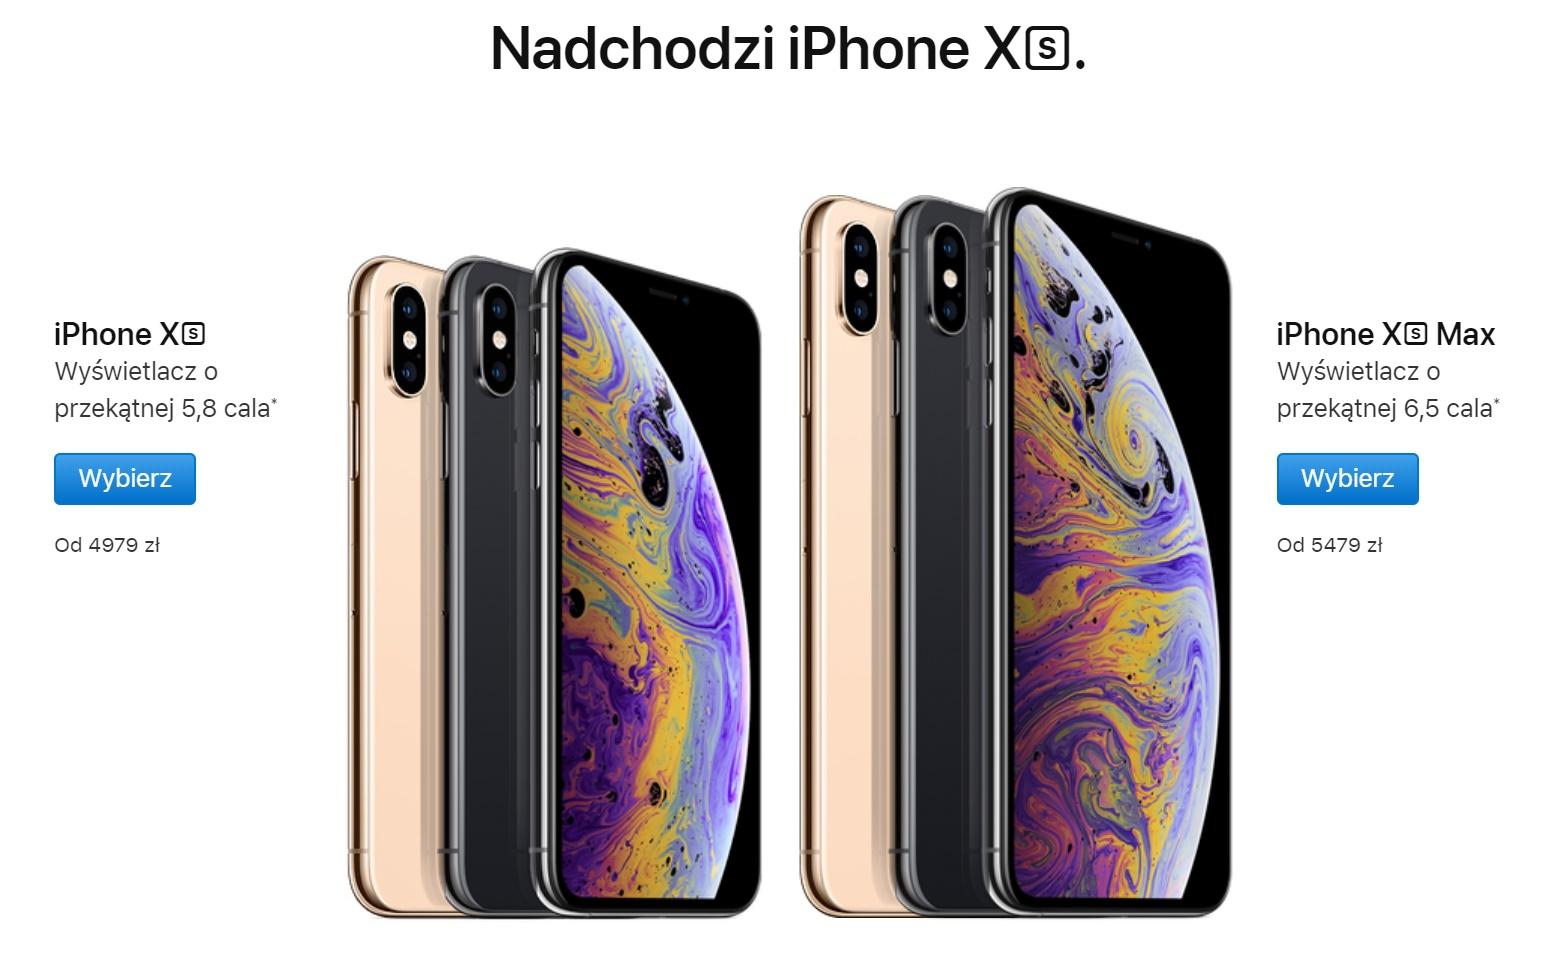 iPhone Xs i iPhone Xs Max - cena